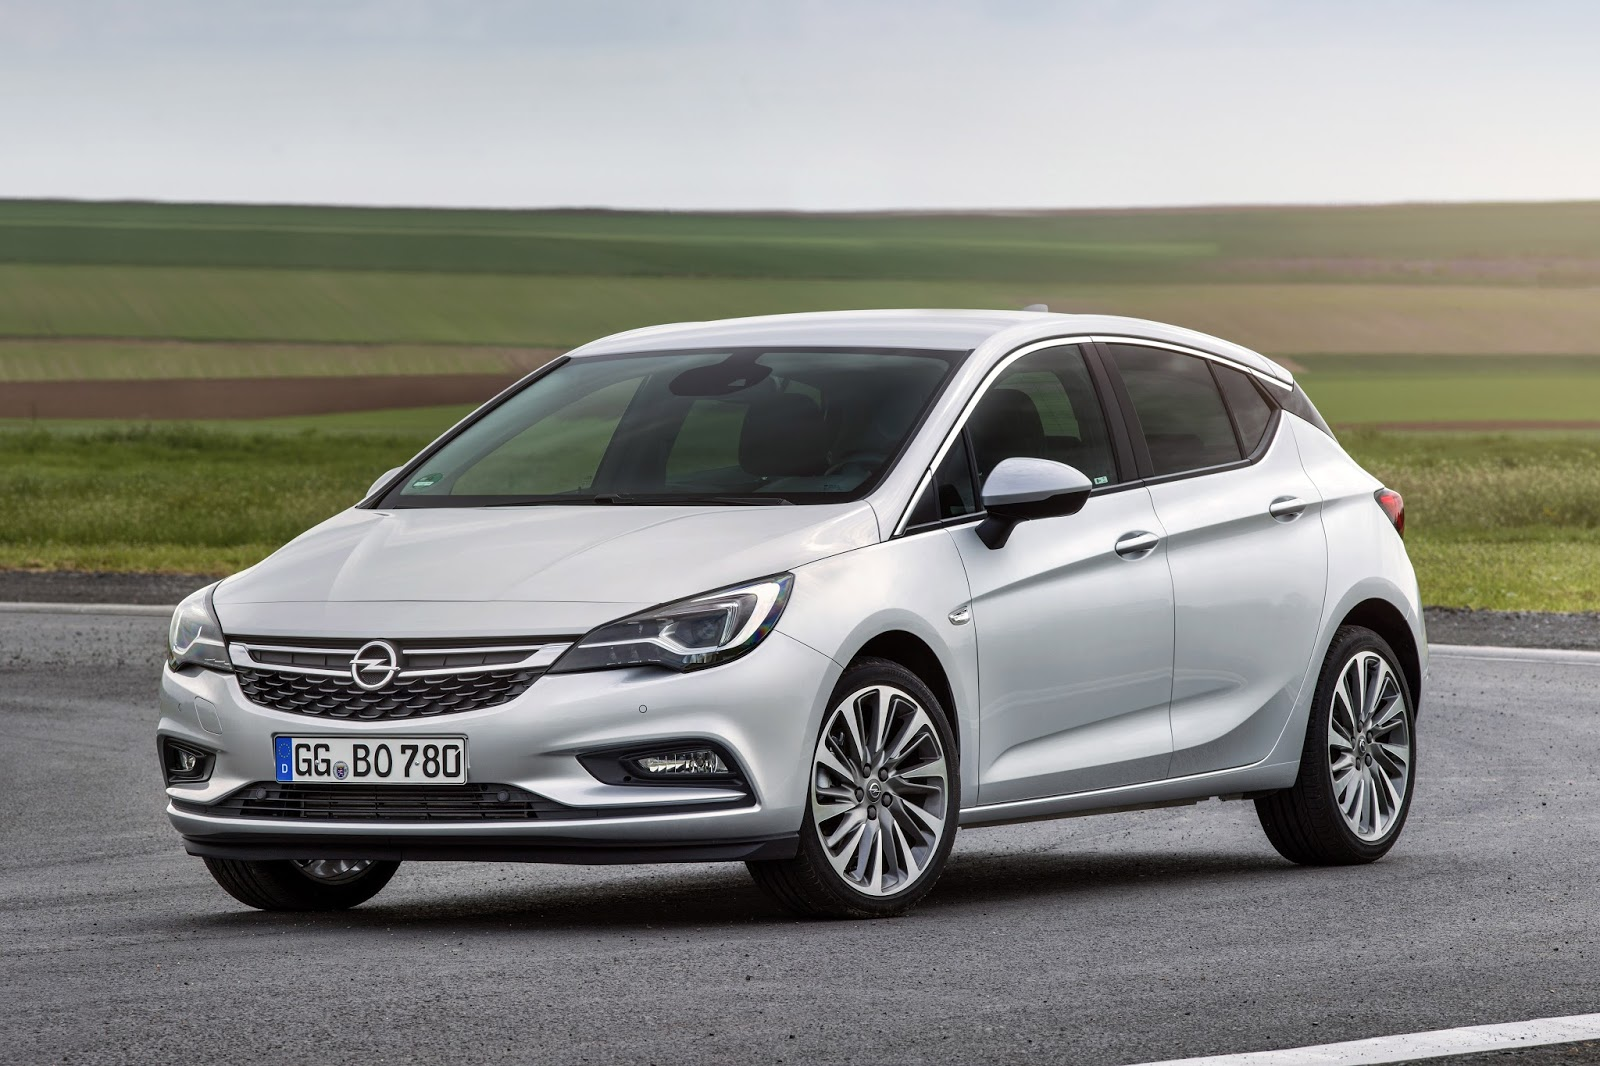 Opel Astra BiTurbo 5 door 301326 Το καυτό Opel Astra BiTurbo diesel συνδυάζει τις επιδόσεις με την οικονομία! Hatchback, Opel, Opel Astra, Opel Astra BiTurbo, Opel Astra BiTurbo Hatchback, twin-turbo